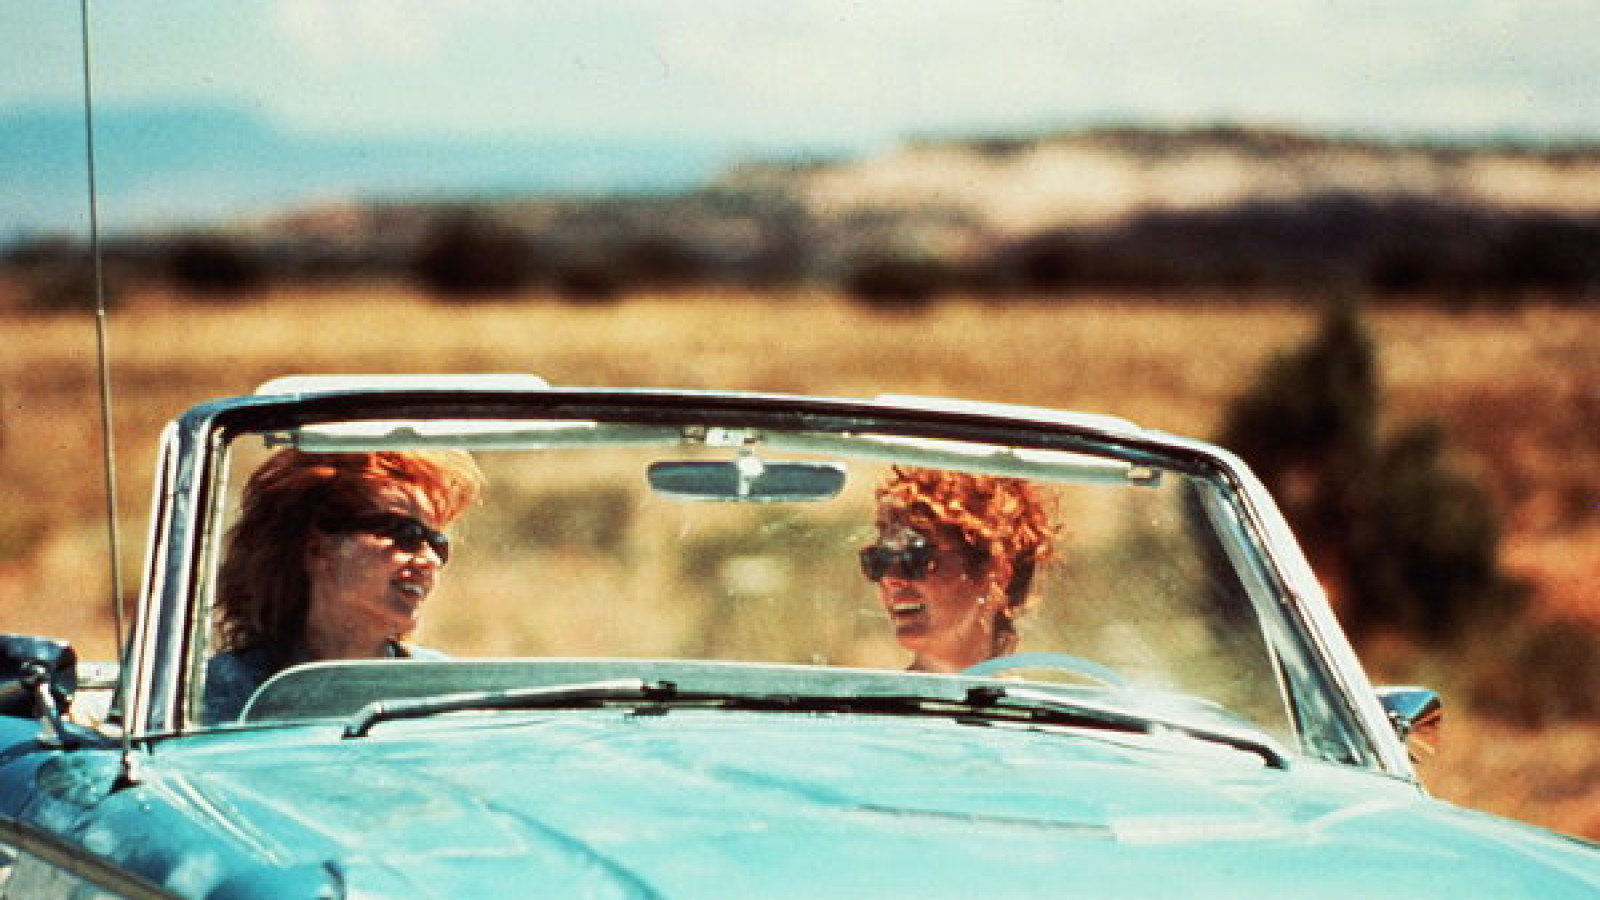 Fotograma del film Thelma & Louise